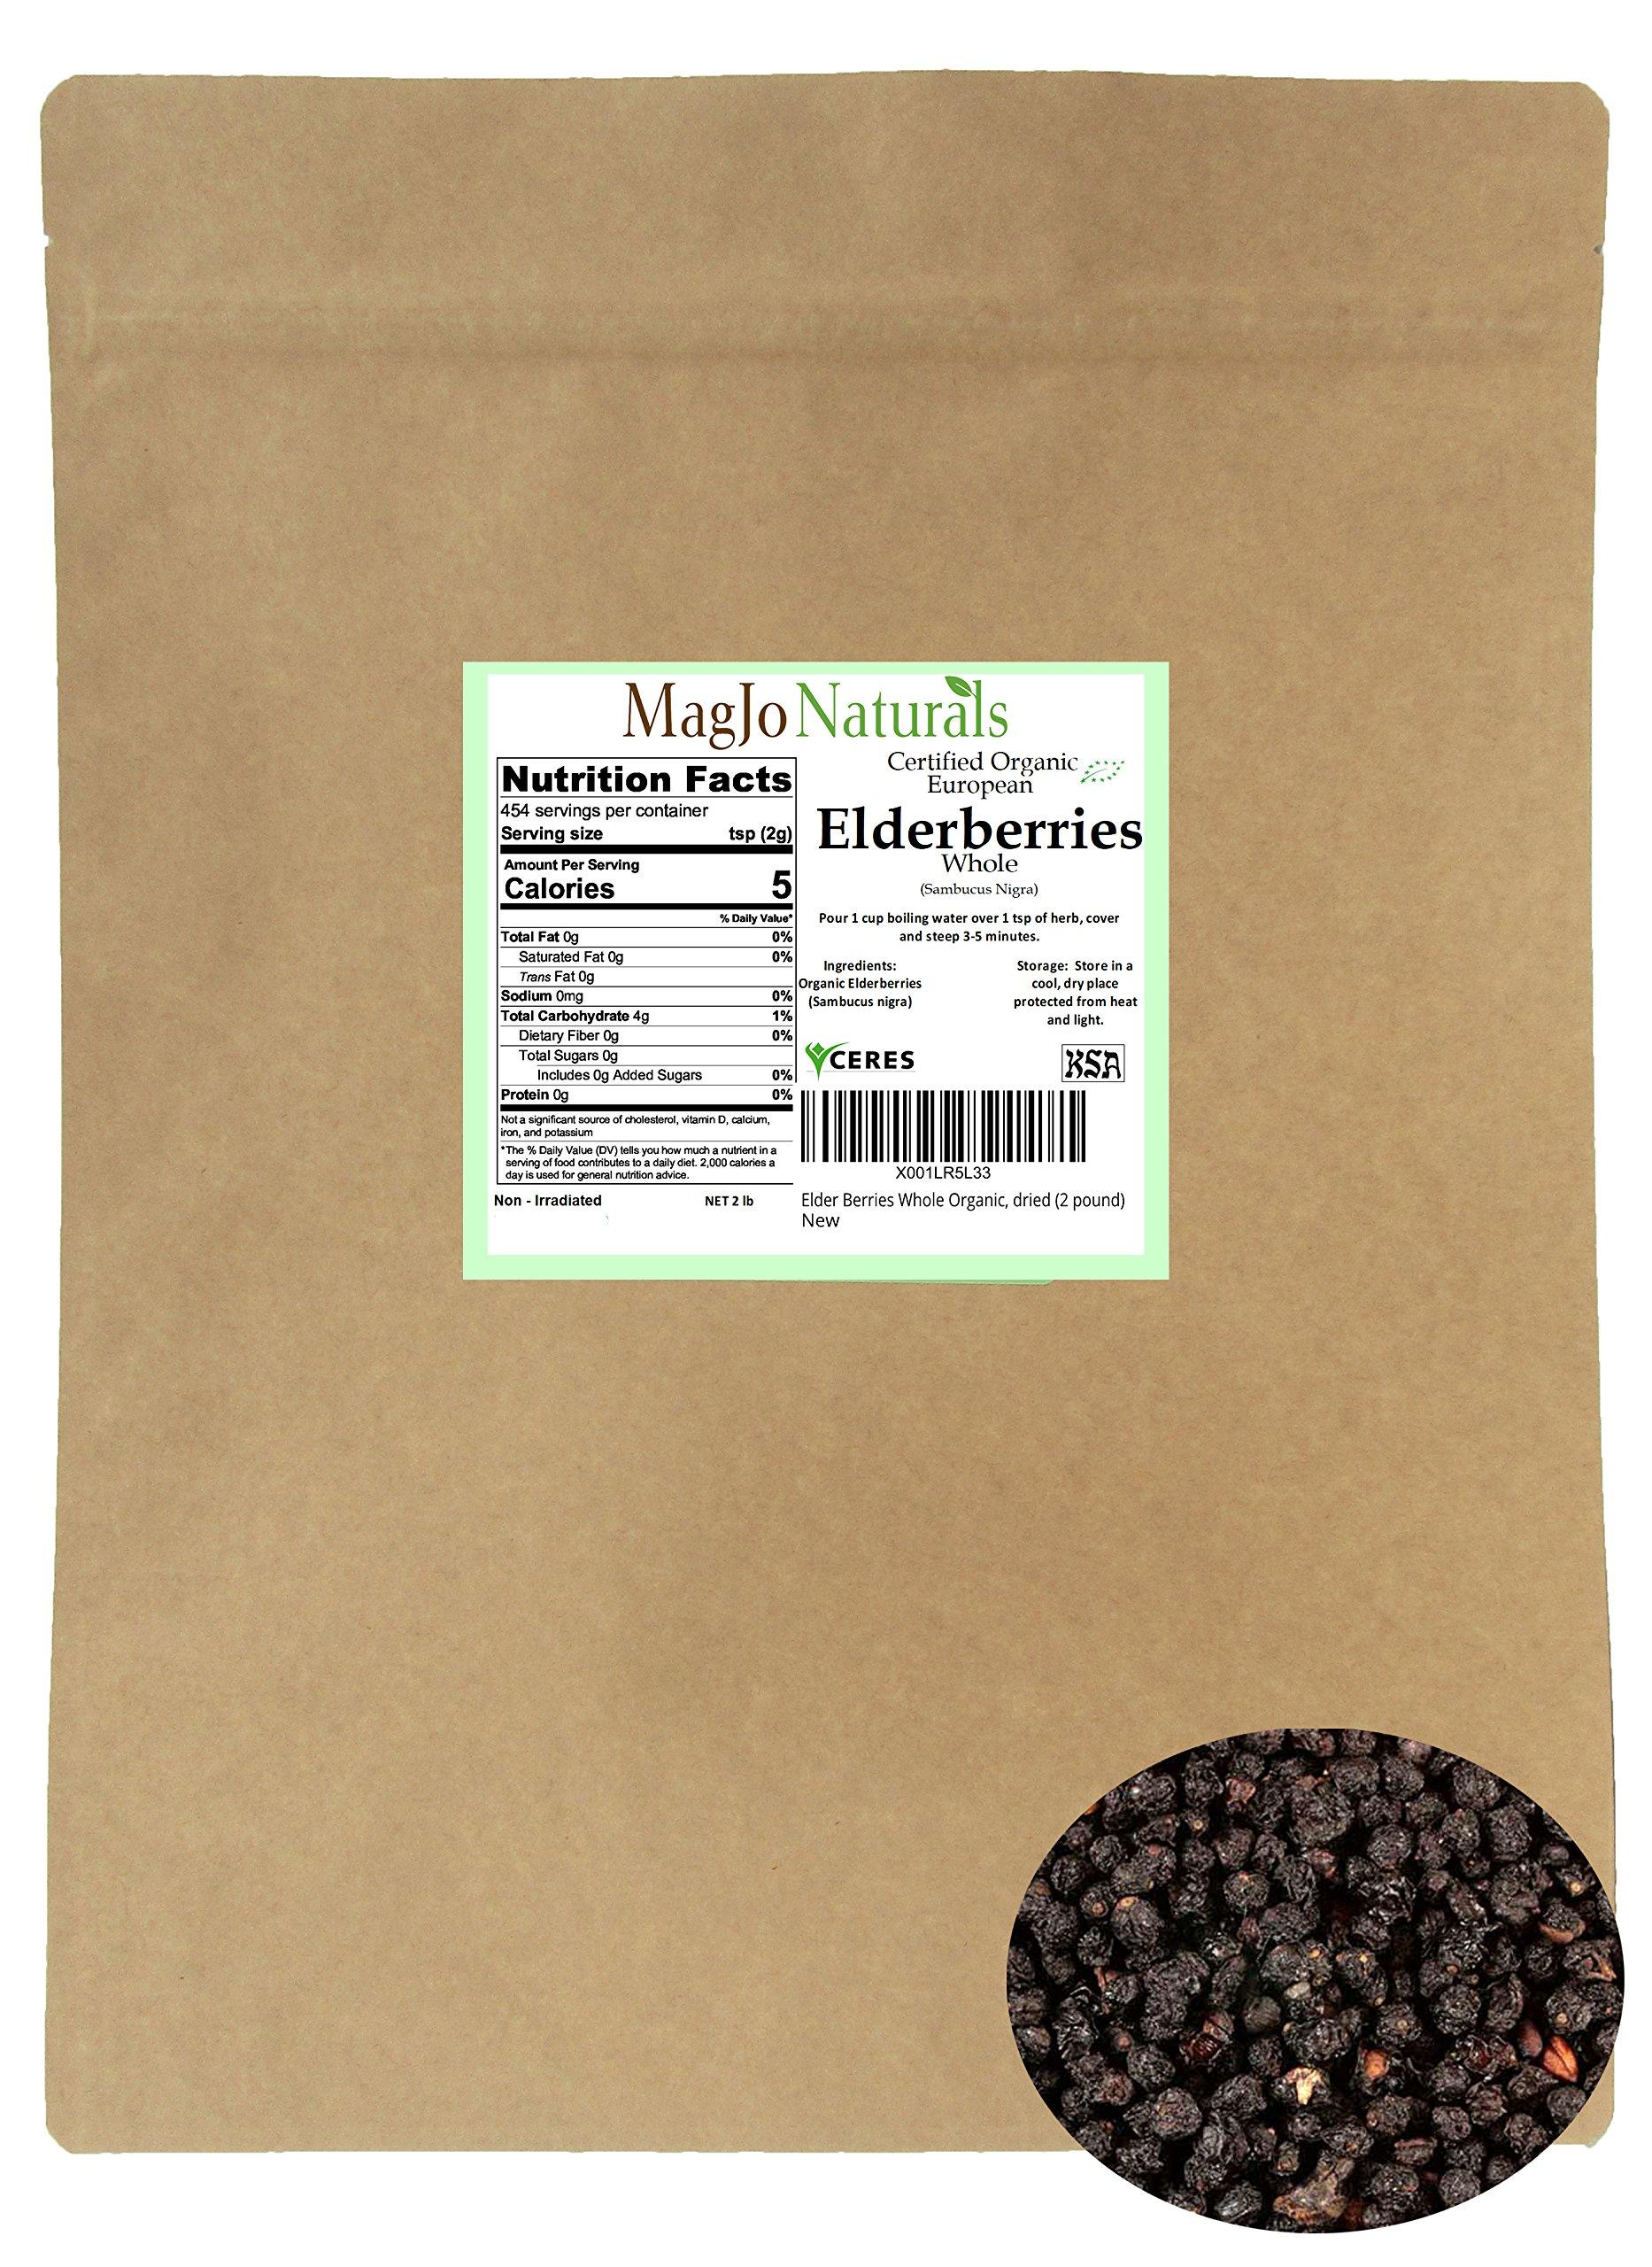 Elder Berries Whole Organic, dried (2 pound)